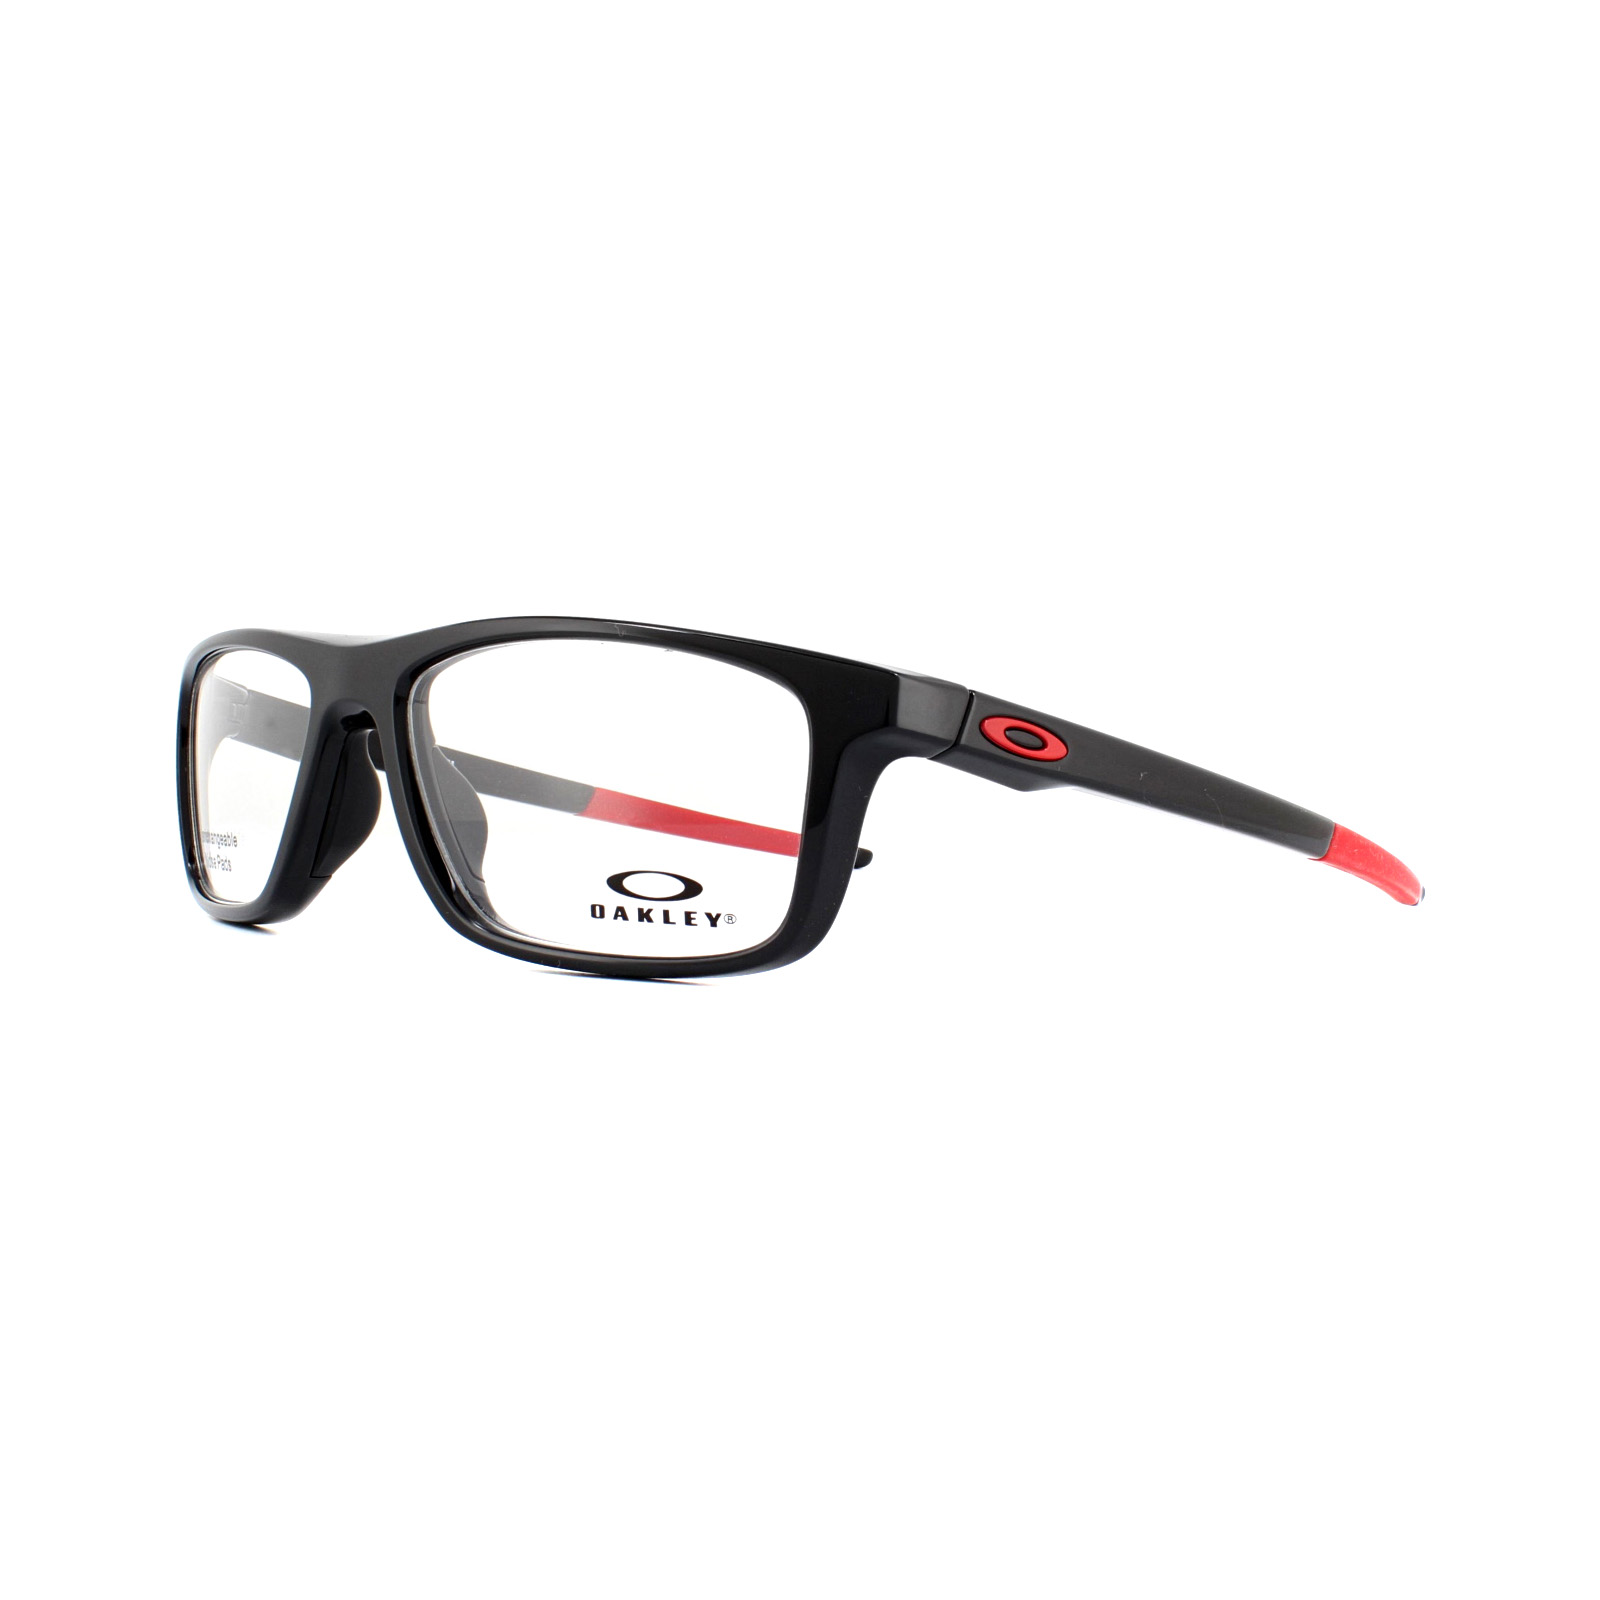 269b158f437 Cheap Oakley Pommel Glasses Frames - Discounted Sunglasses